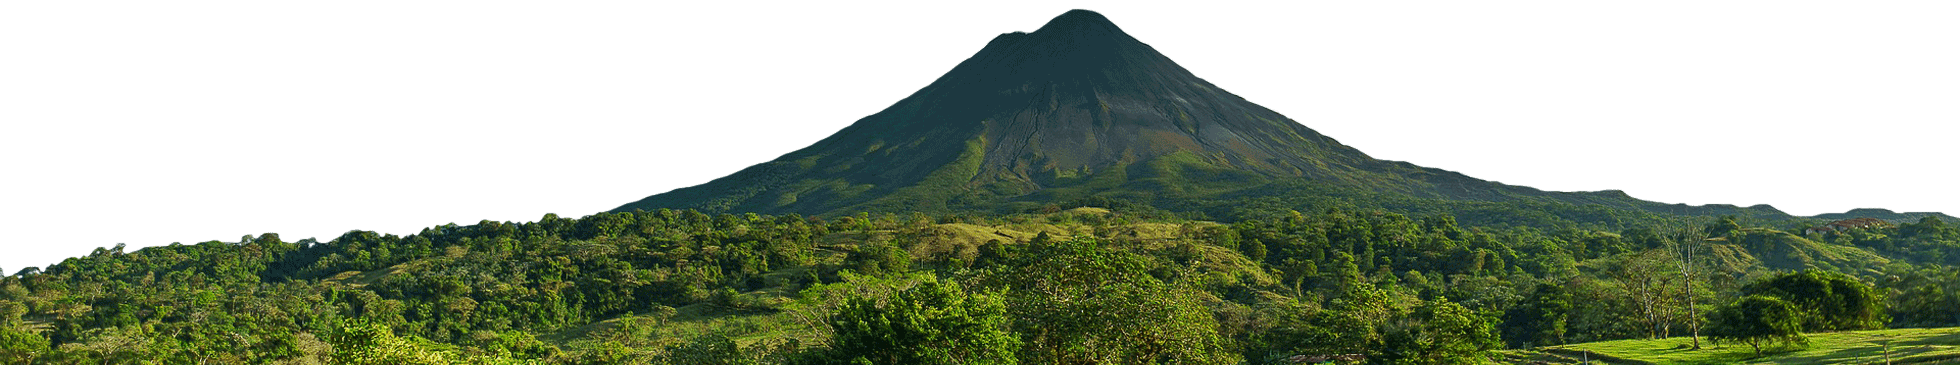 Visuel horizontal voyage Costa Rica